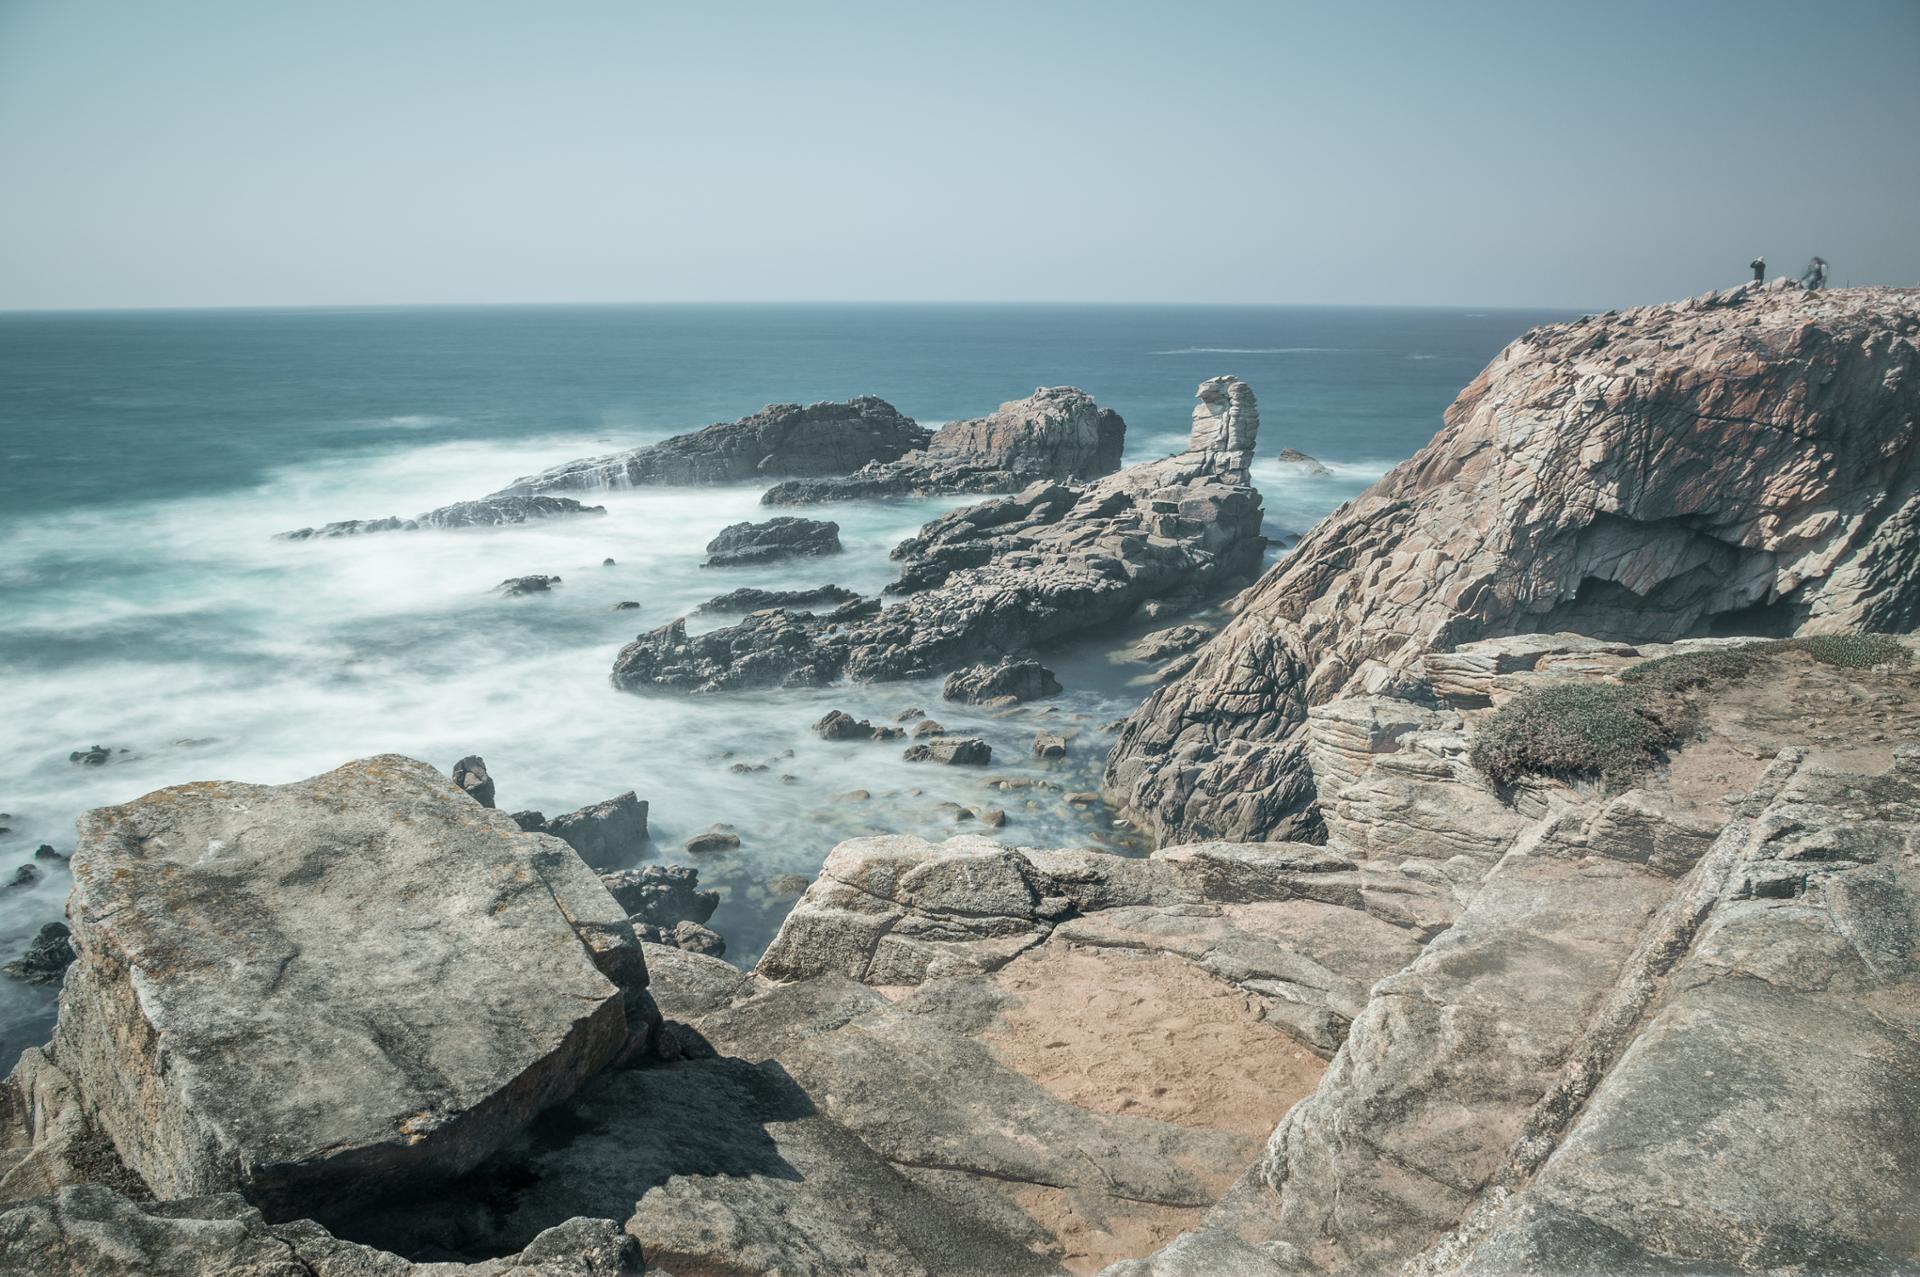 La côte sauvage de Quiberon